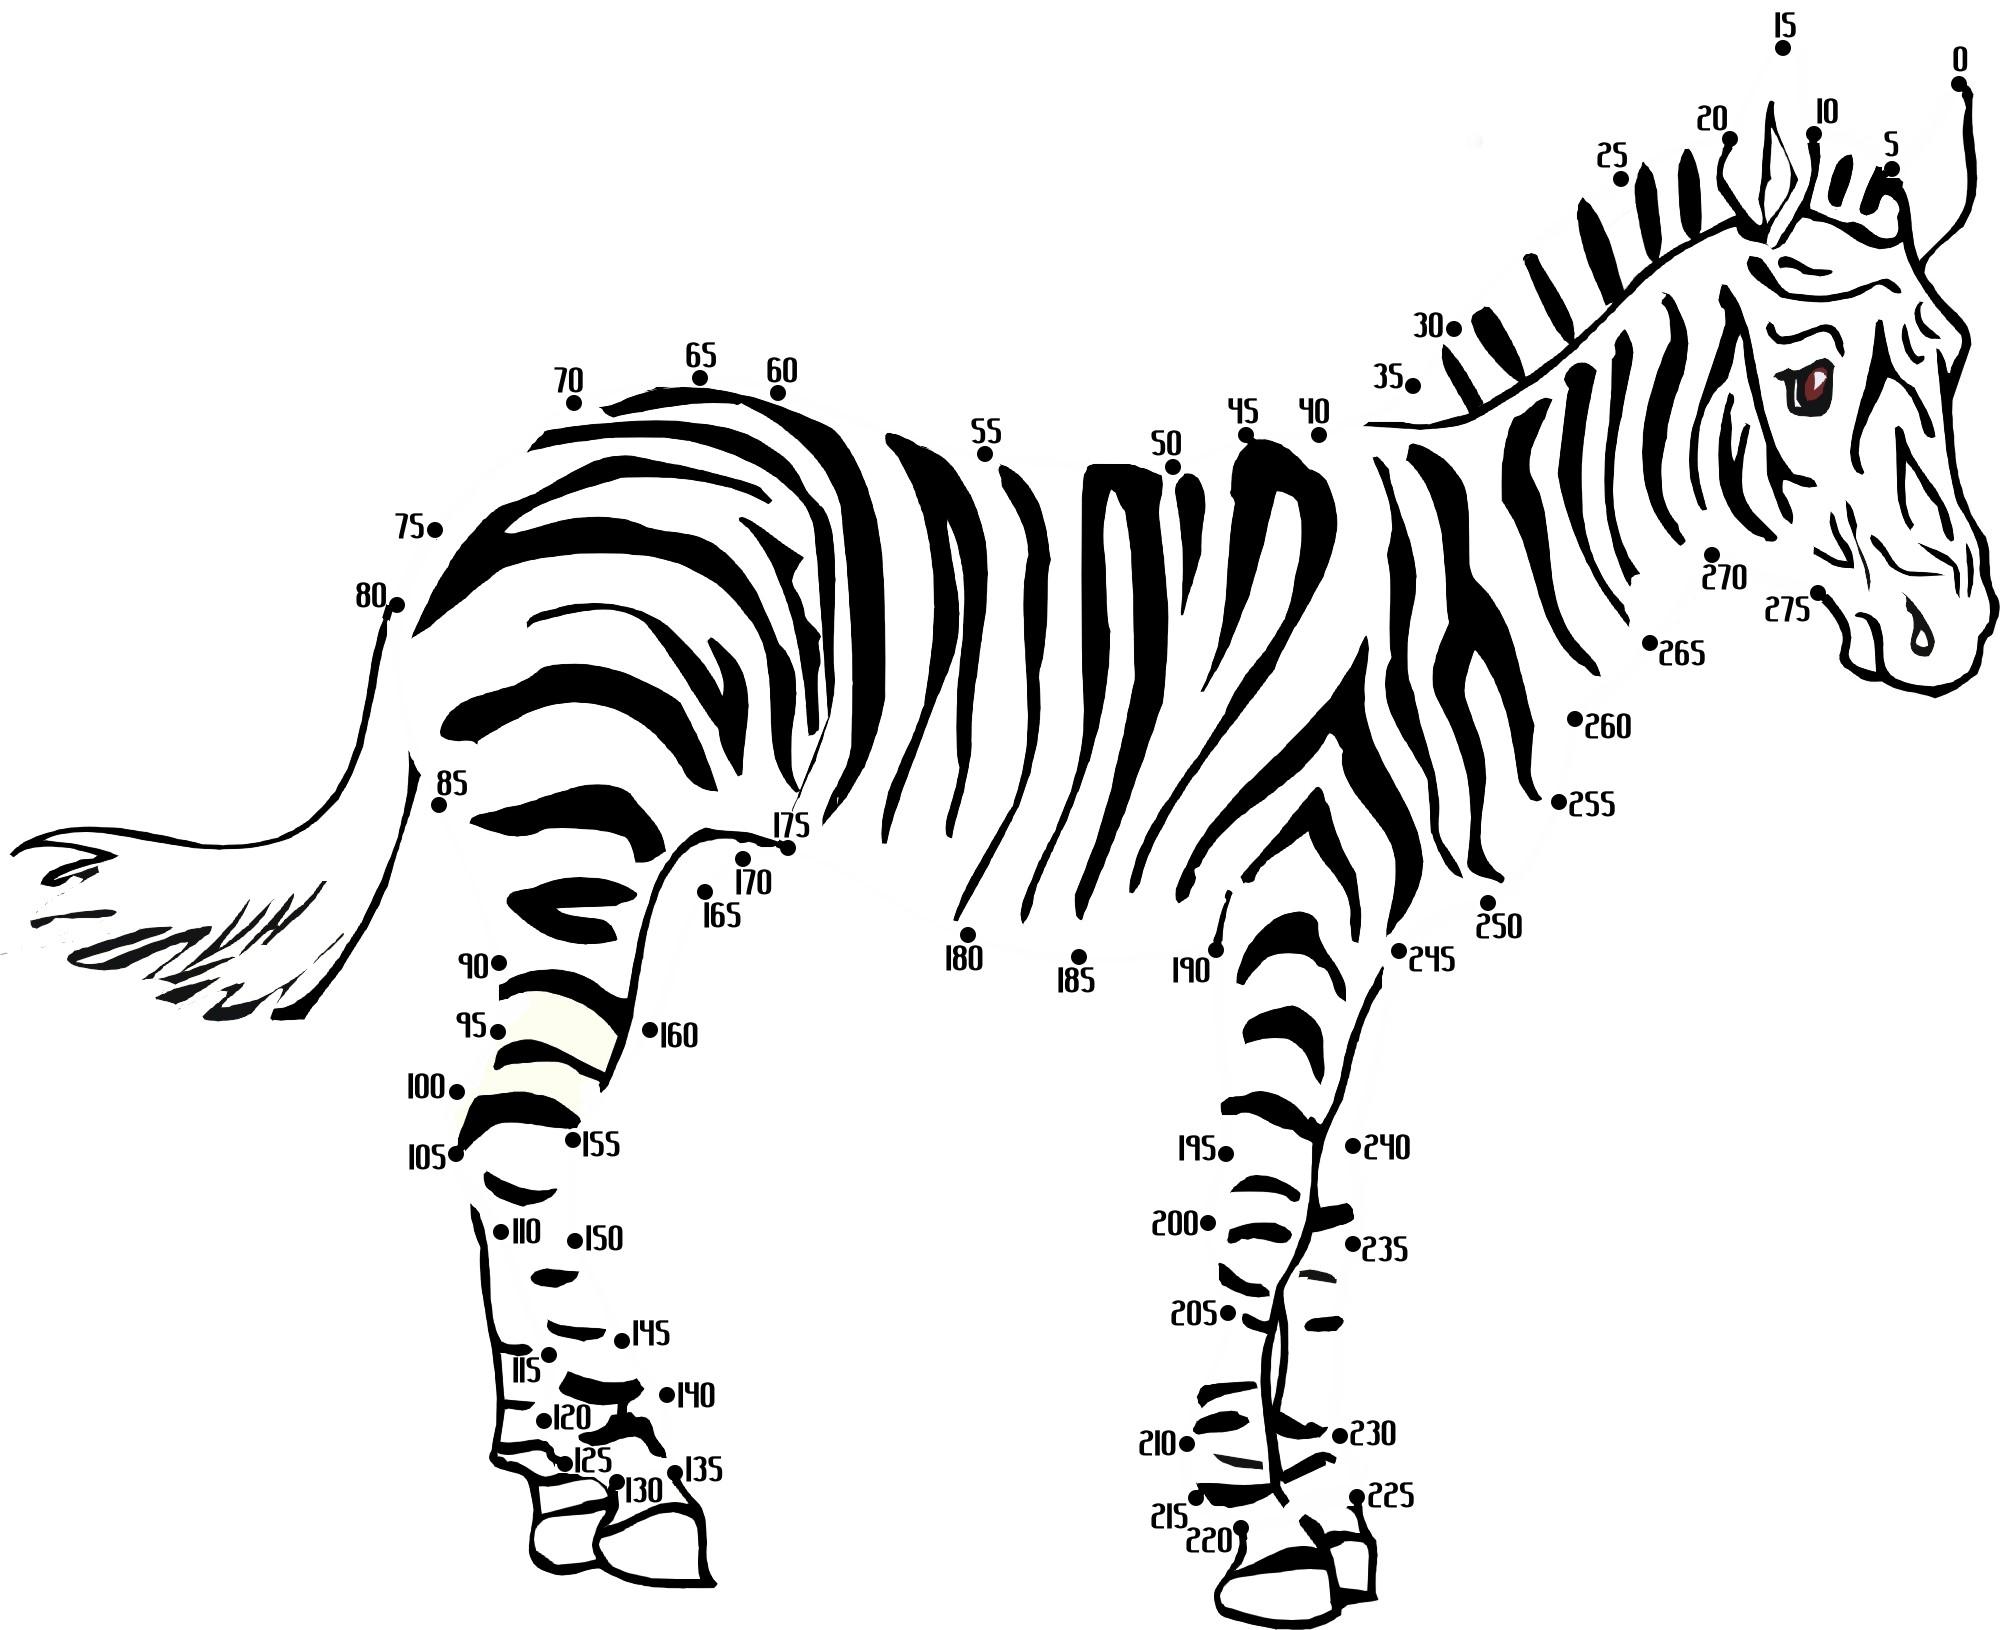 100+ Free Printable Animal Dot-to-dot Activity Worksheets